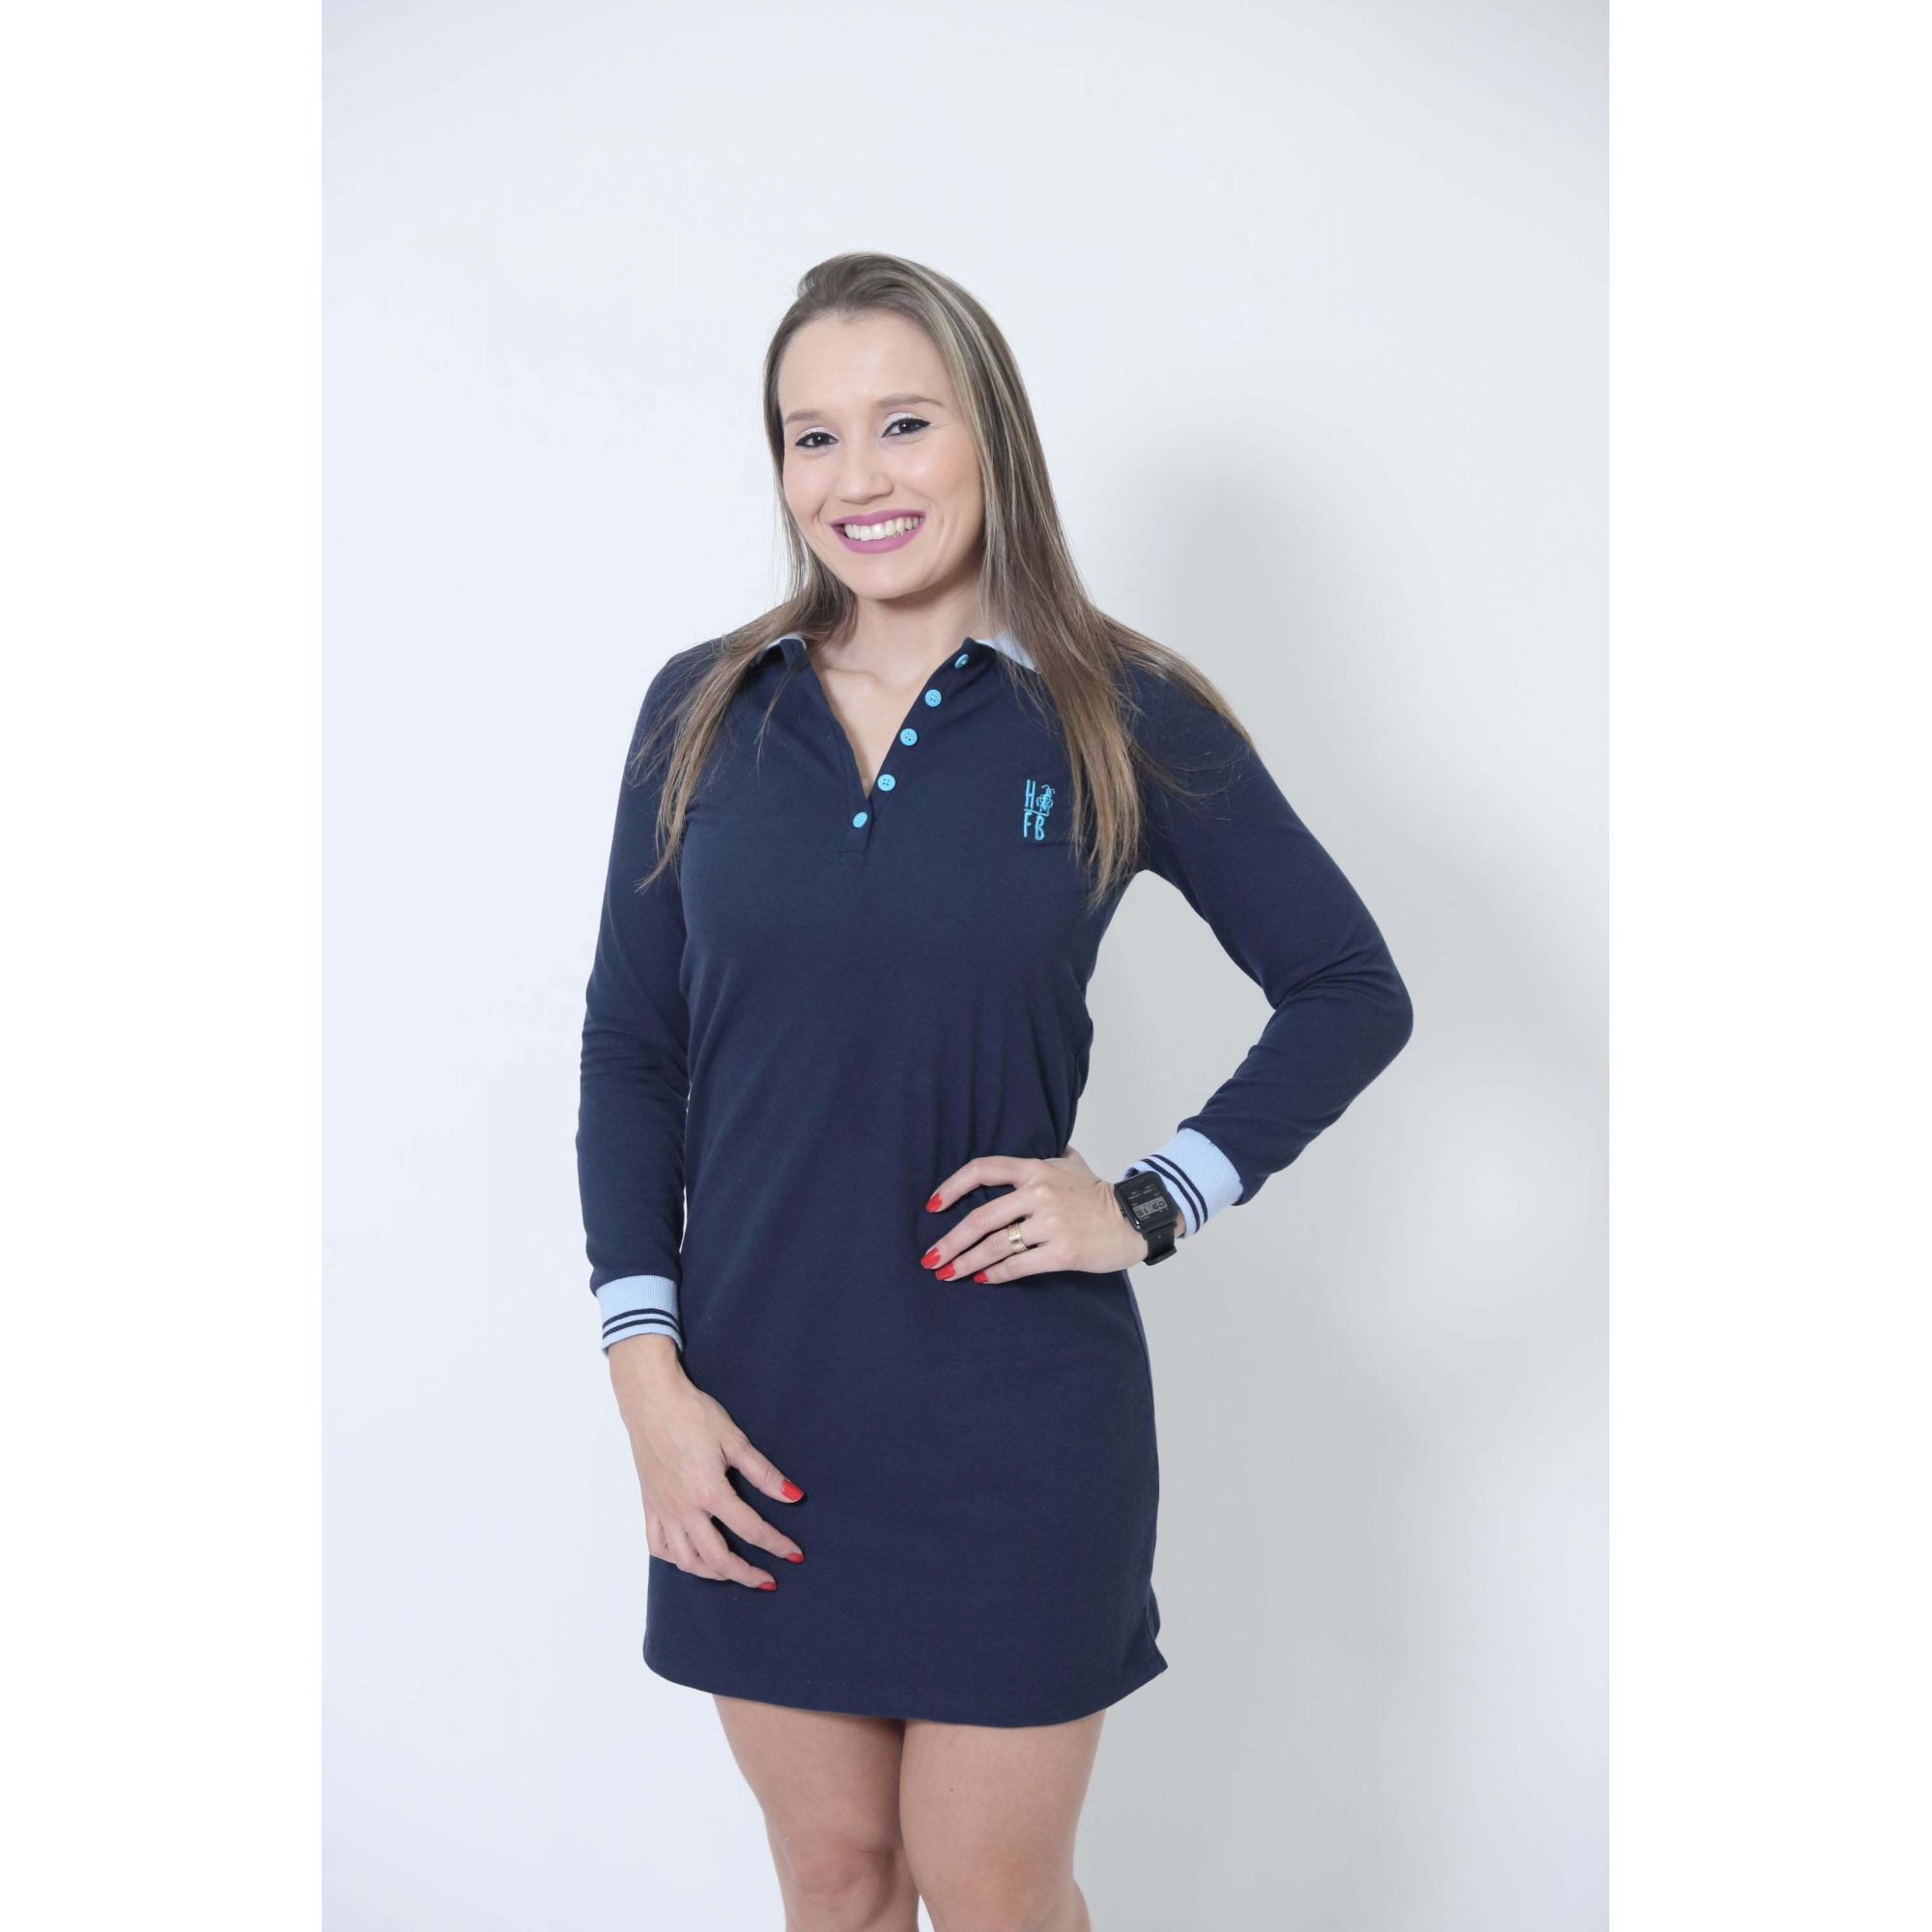 MÃE E FILHO > Kit 02 Peças Vestido + Camisa Polo ou Body Manga Longa Azul [Coleção Tal Mãe Tal Filho]  - Heitor Fashion Brazil